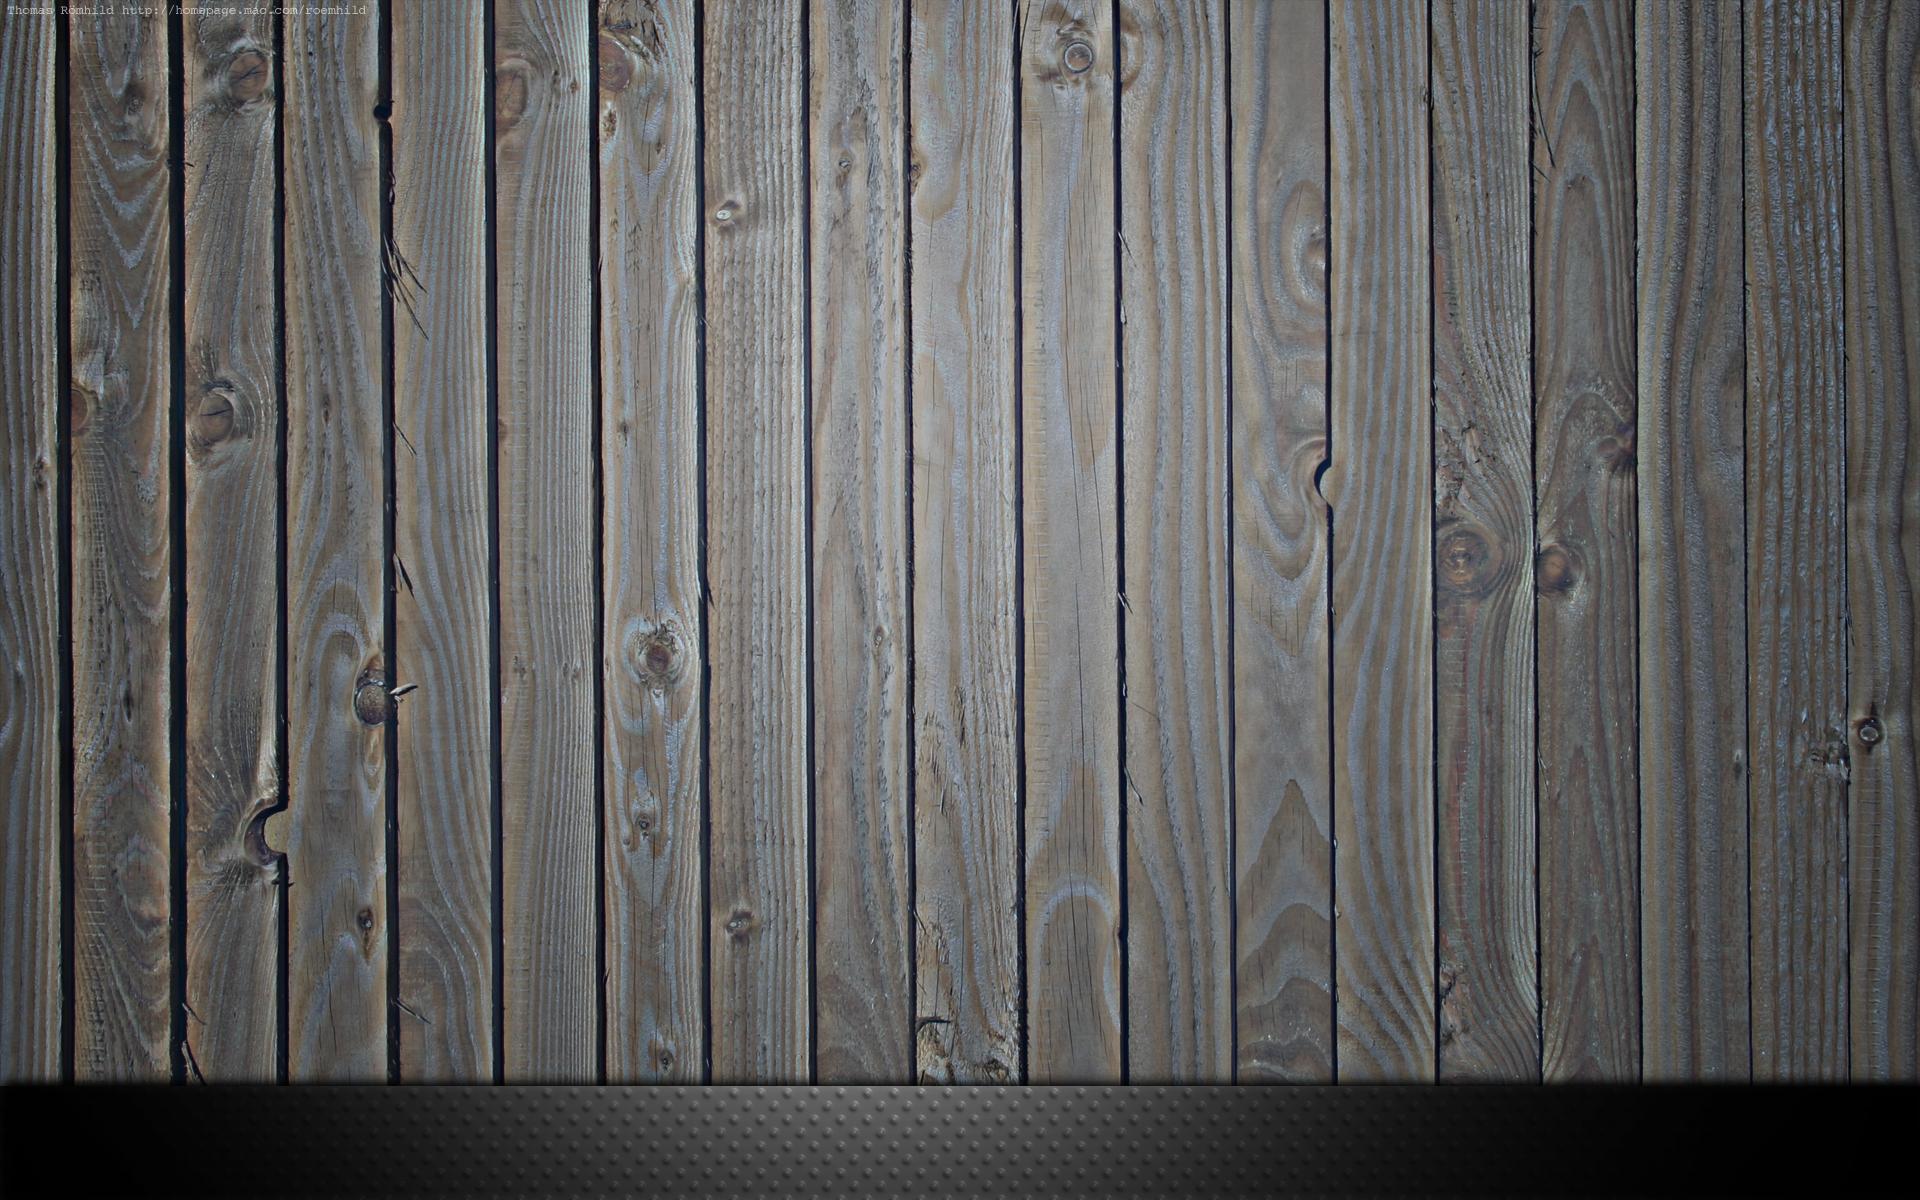 wood design wallpaper photo - 5